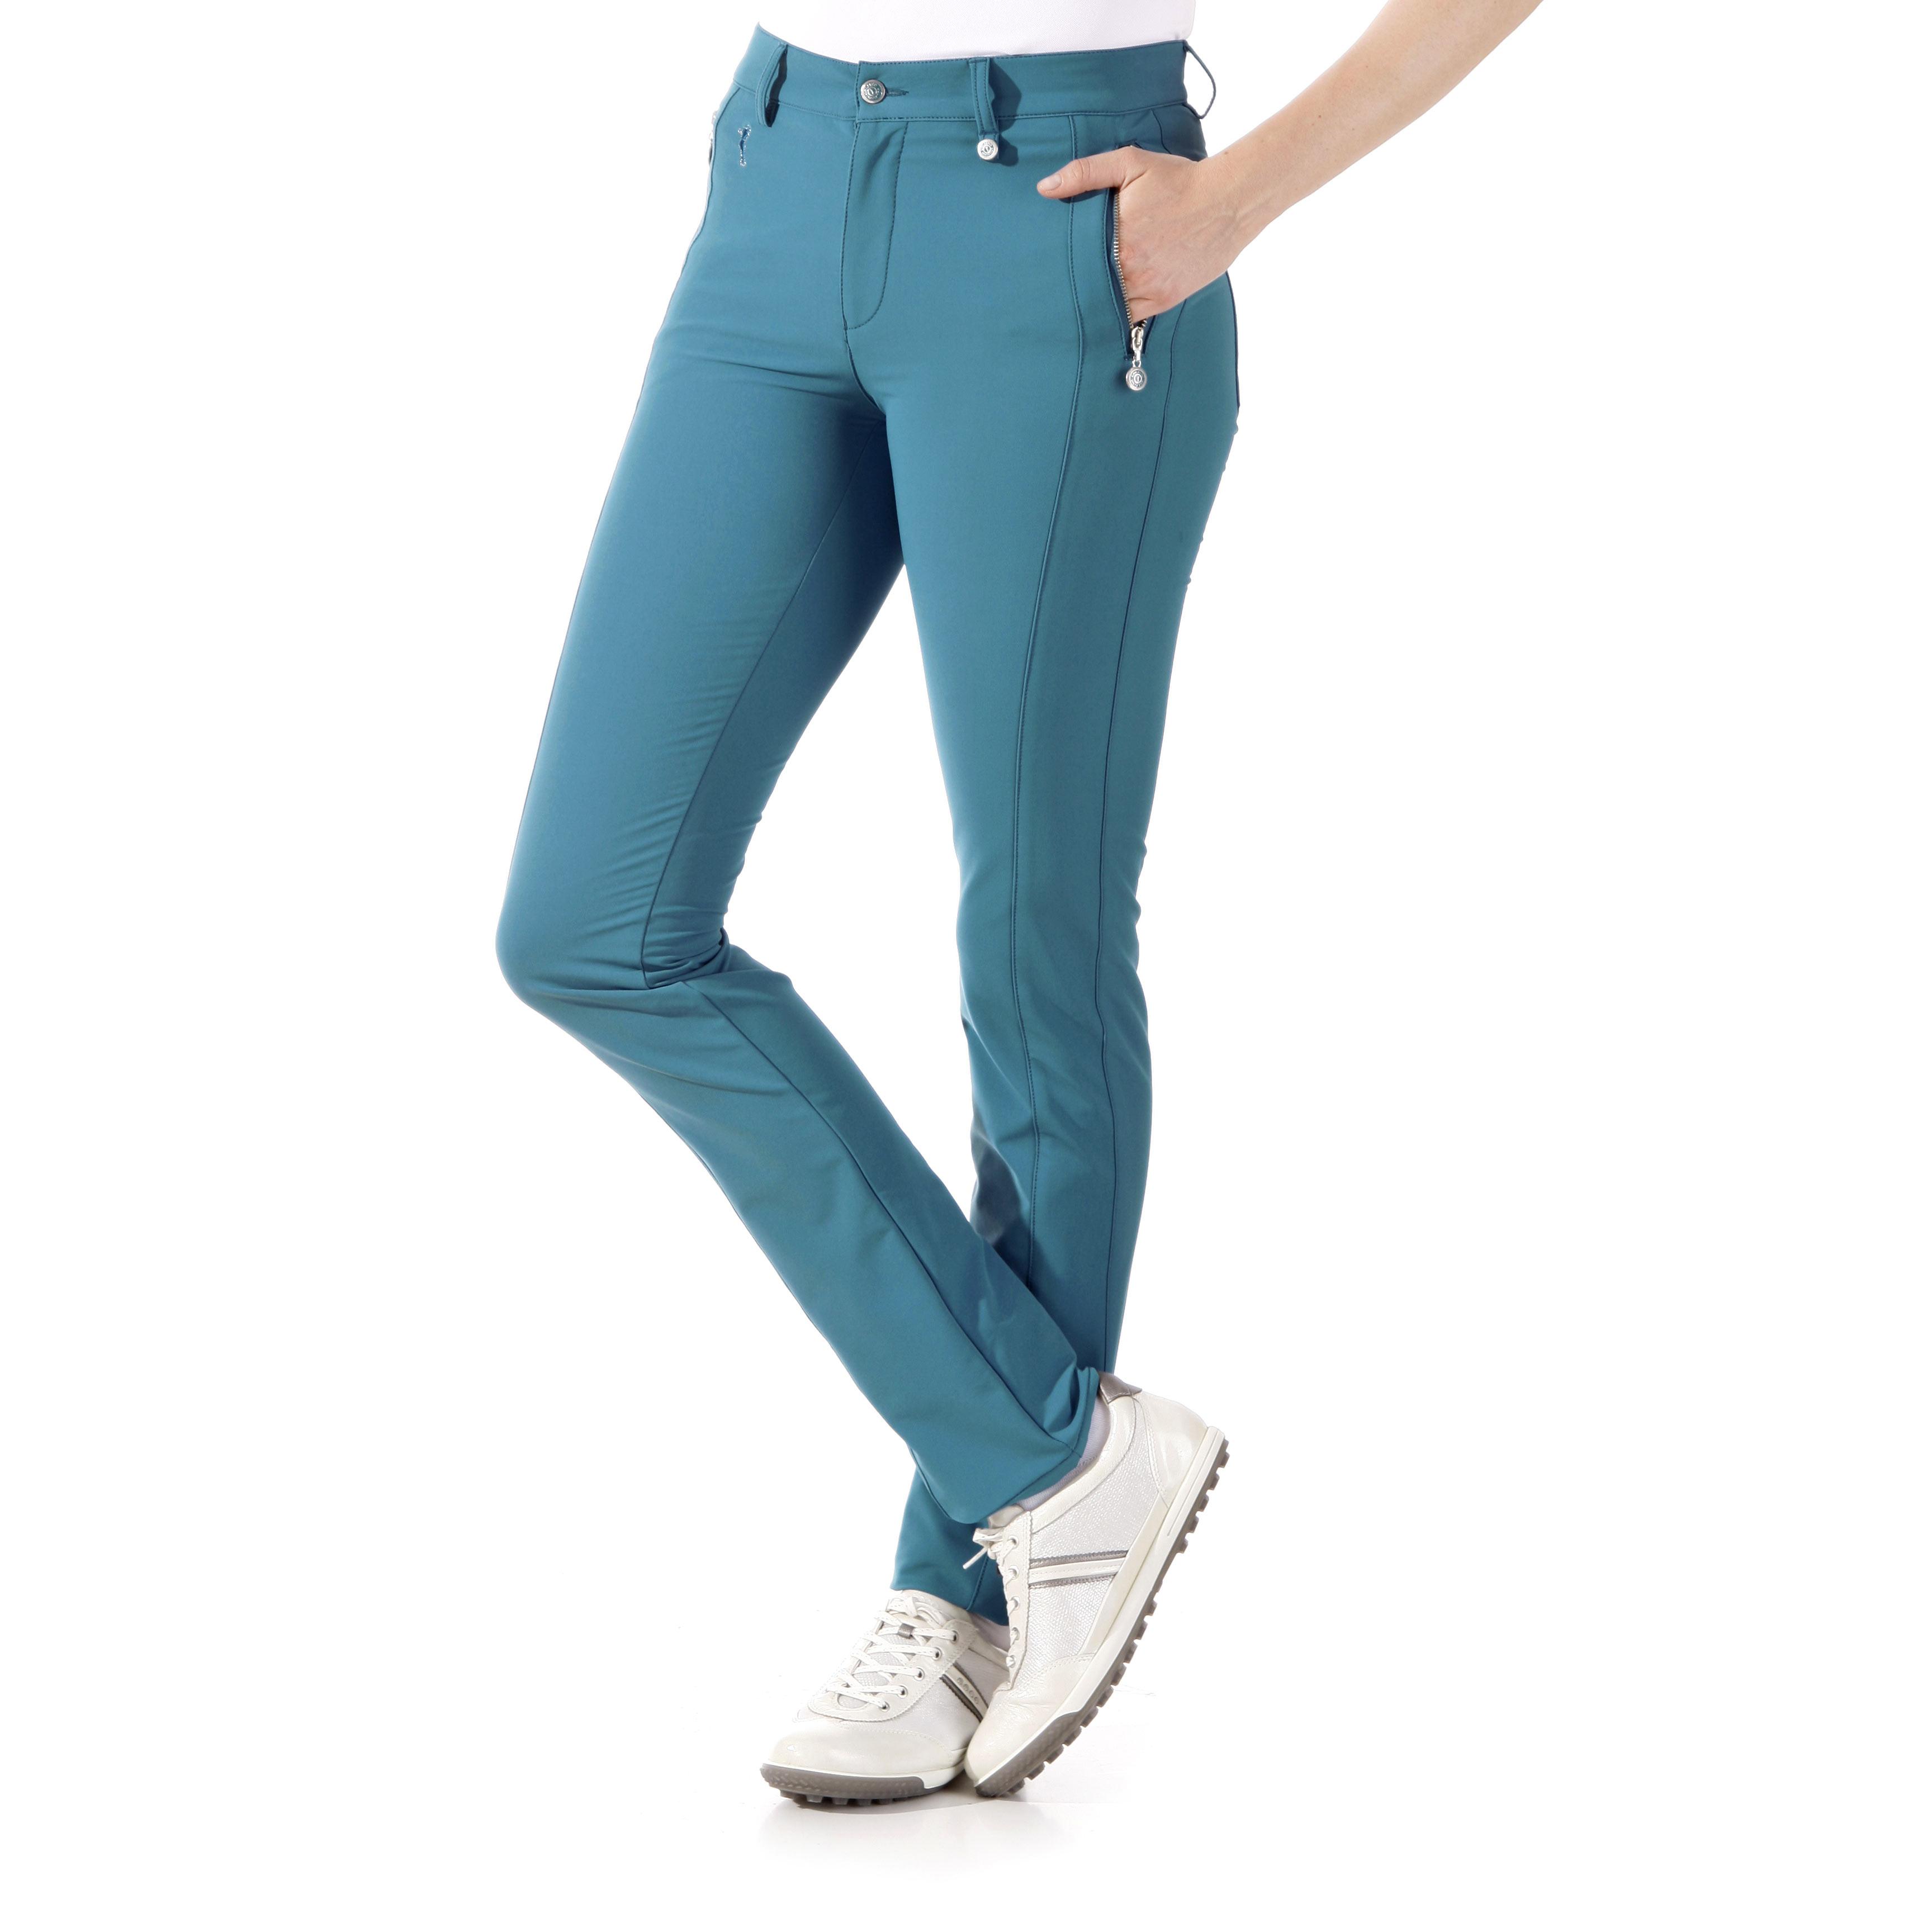 Hose aus gebürstetem 4-Way-Stretchmaterial